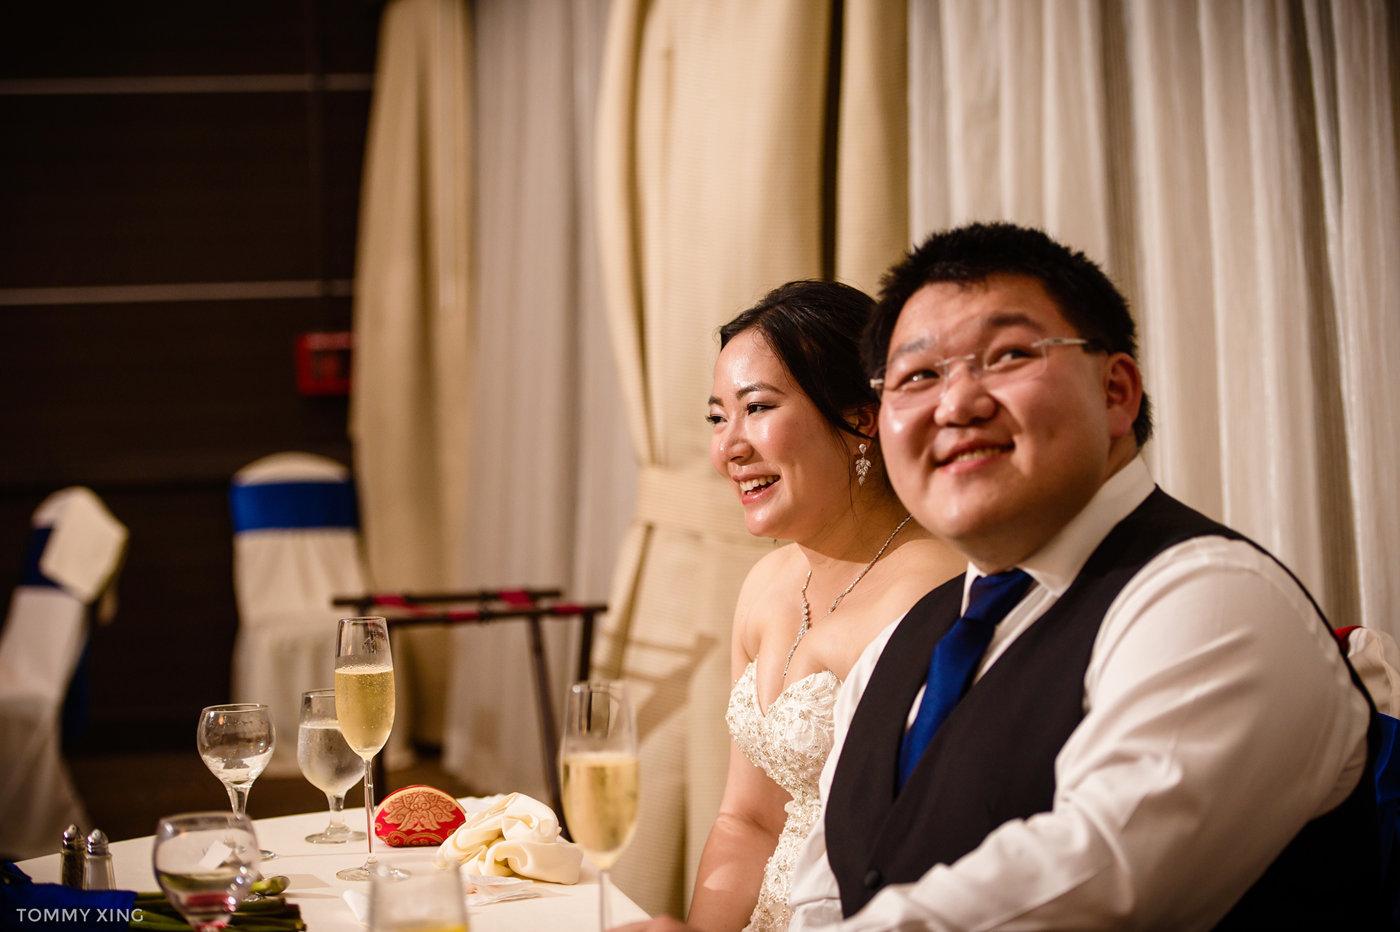 STANFORD MEMORIAL CHURCH WEDDING - Wenjie & Chengcheng - SAN FRANCISCO BAY AREA 斯坦福教堂婚礼跟拍 - 洛杉矶婚礼婚纱照摄影师 Tommy Xing Photography204.jpg